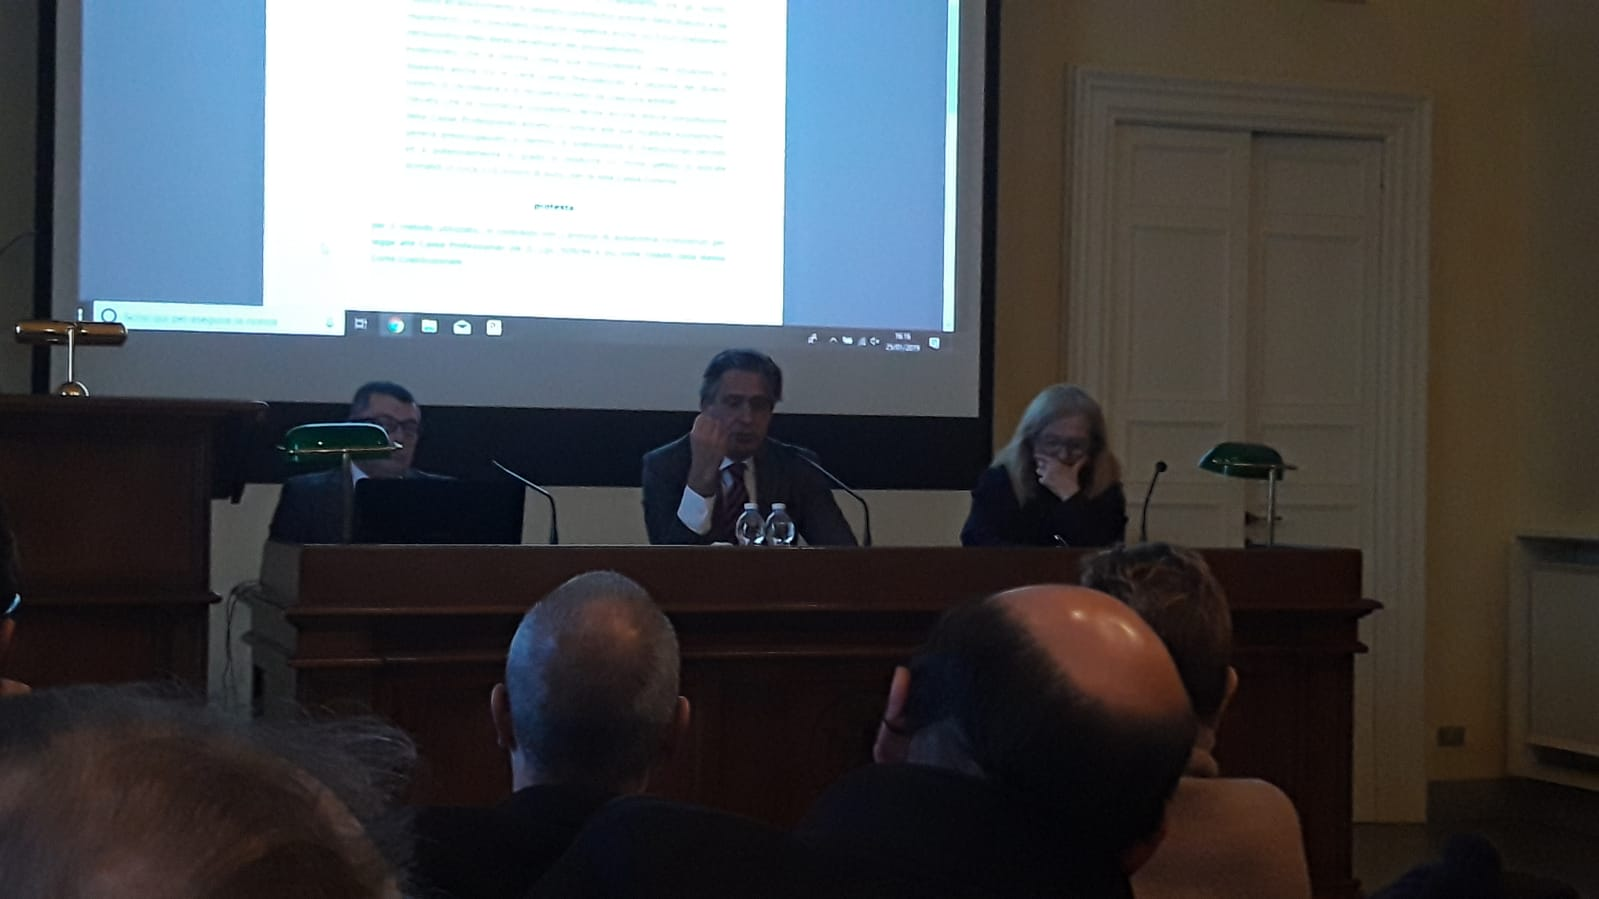 Convegno avvocati pavia Girolamo De Rada regole deontologiche indagini difensive